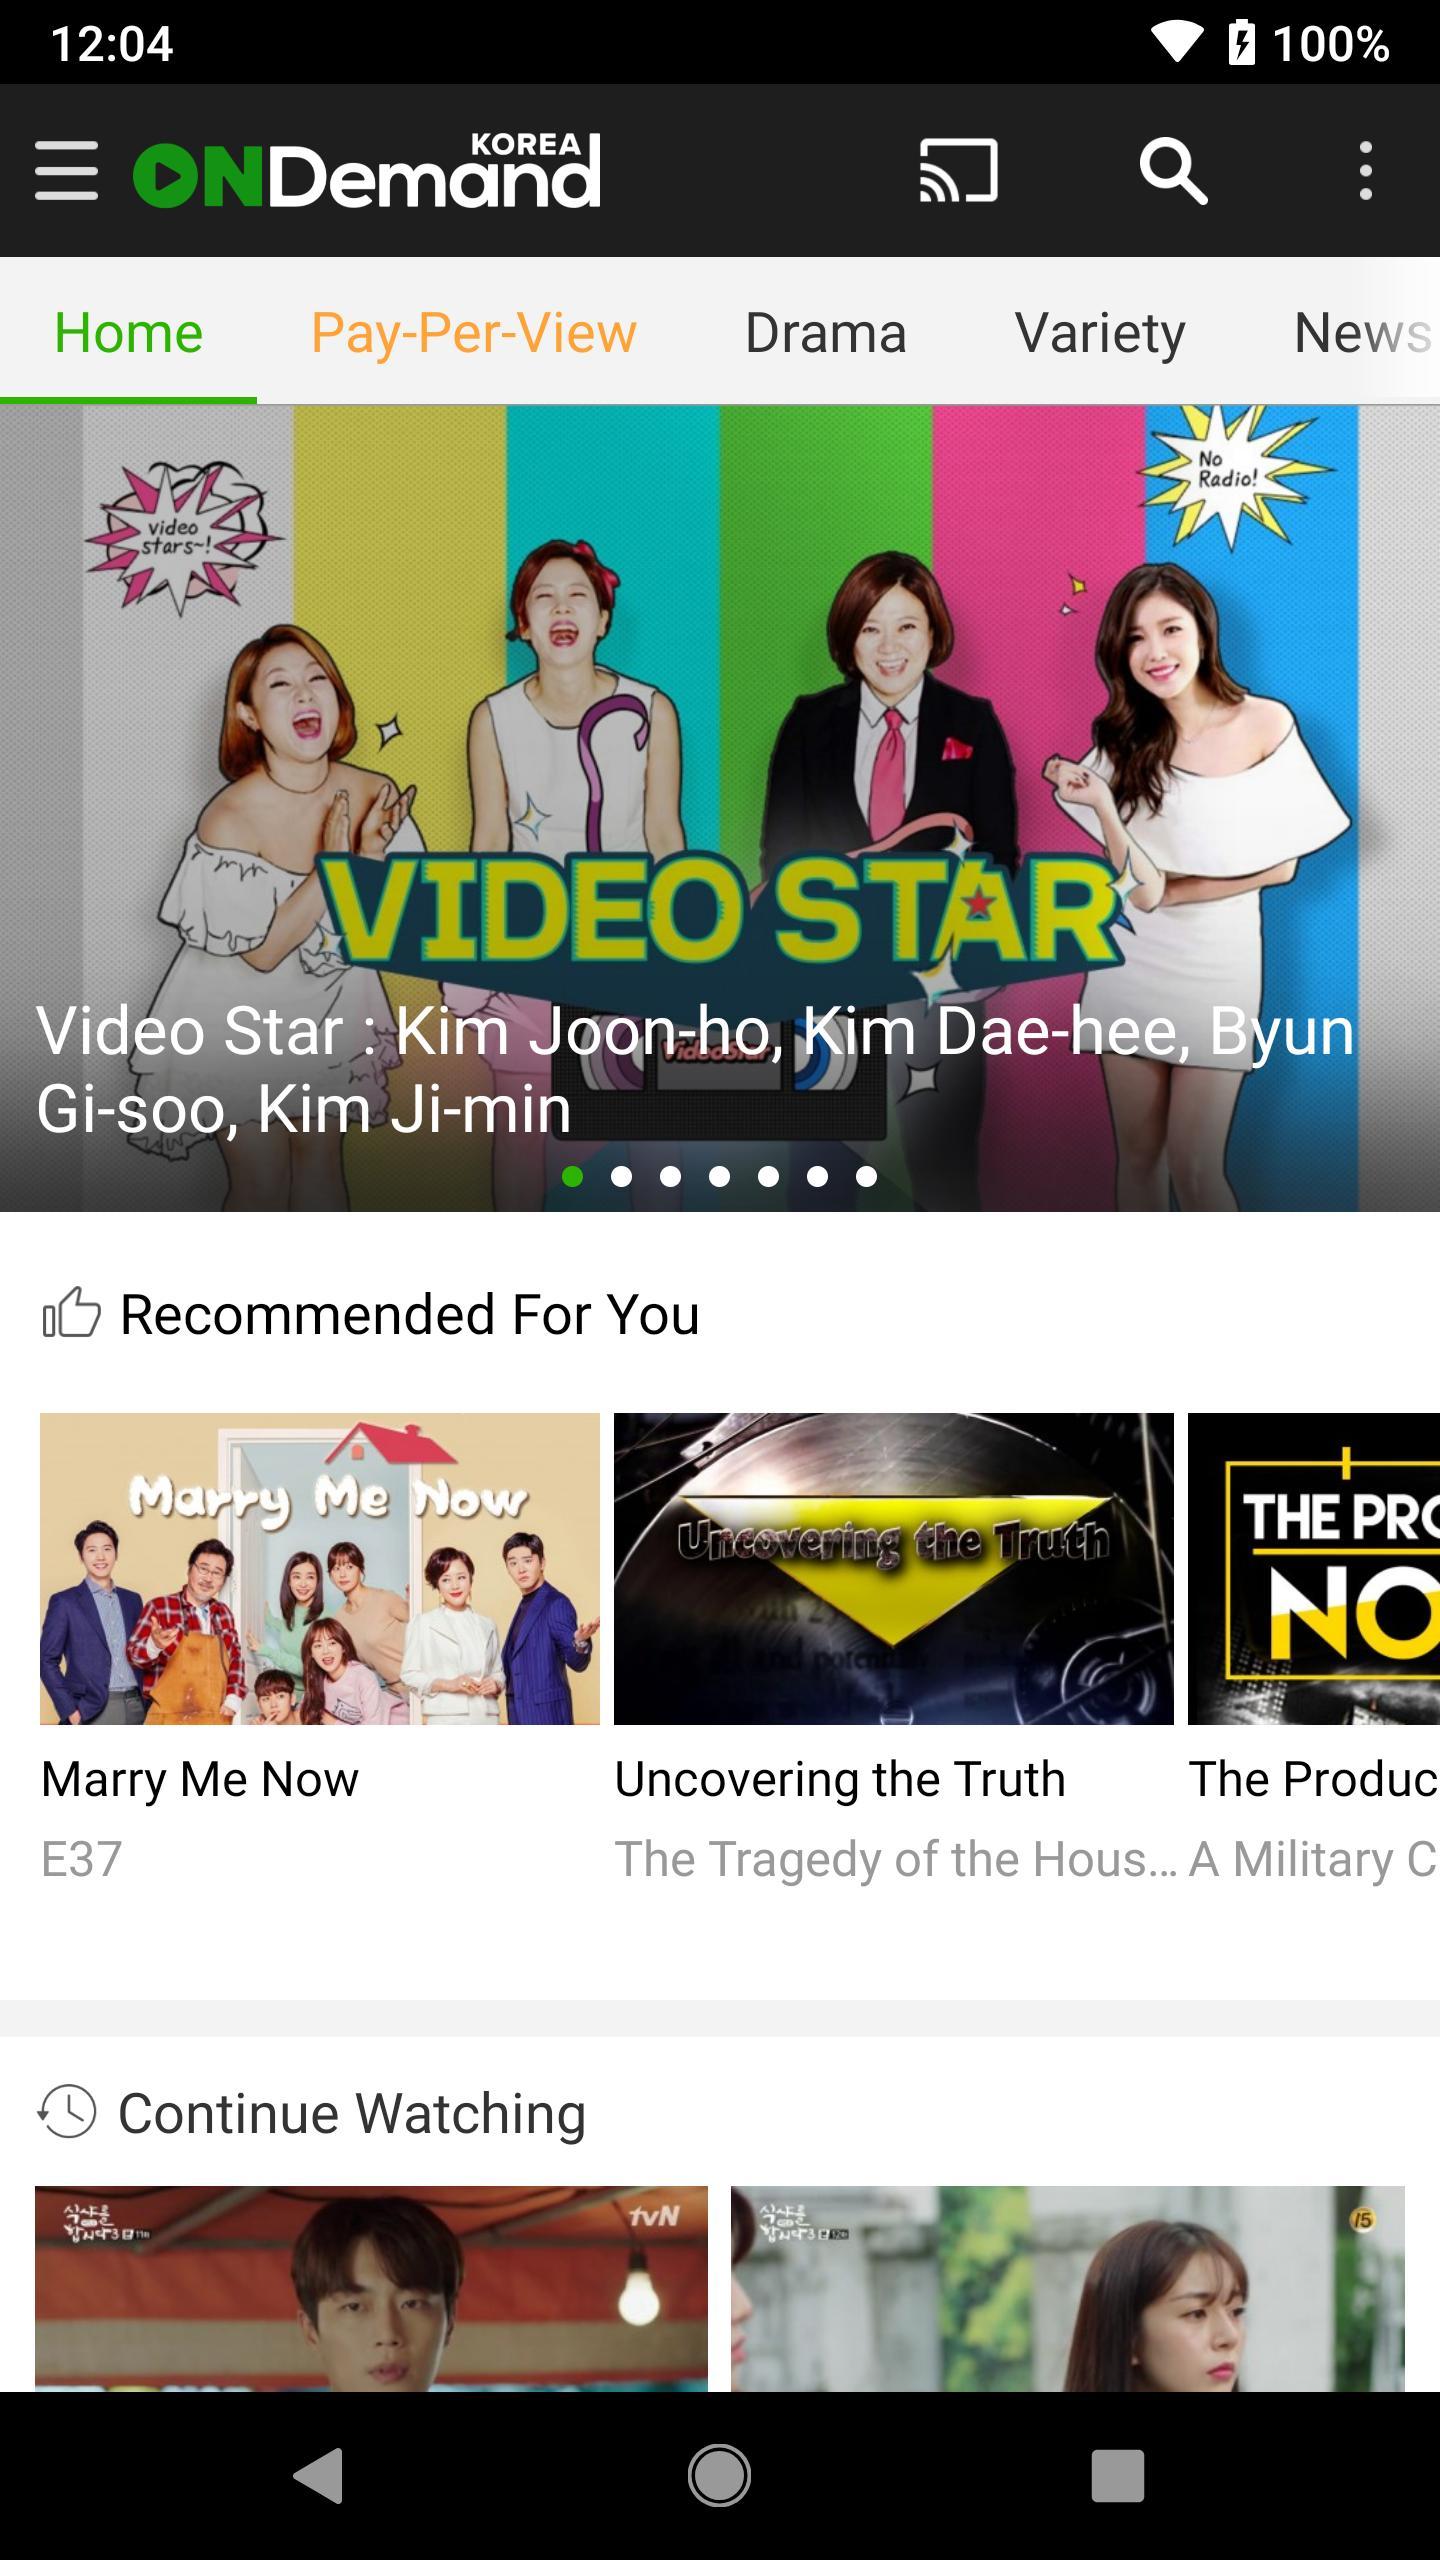 ondemandkorea apk for android tv